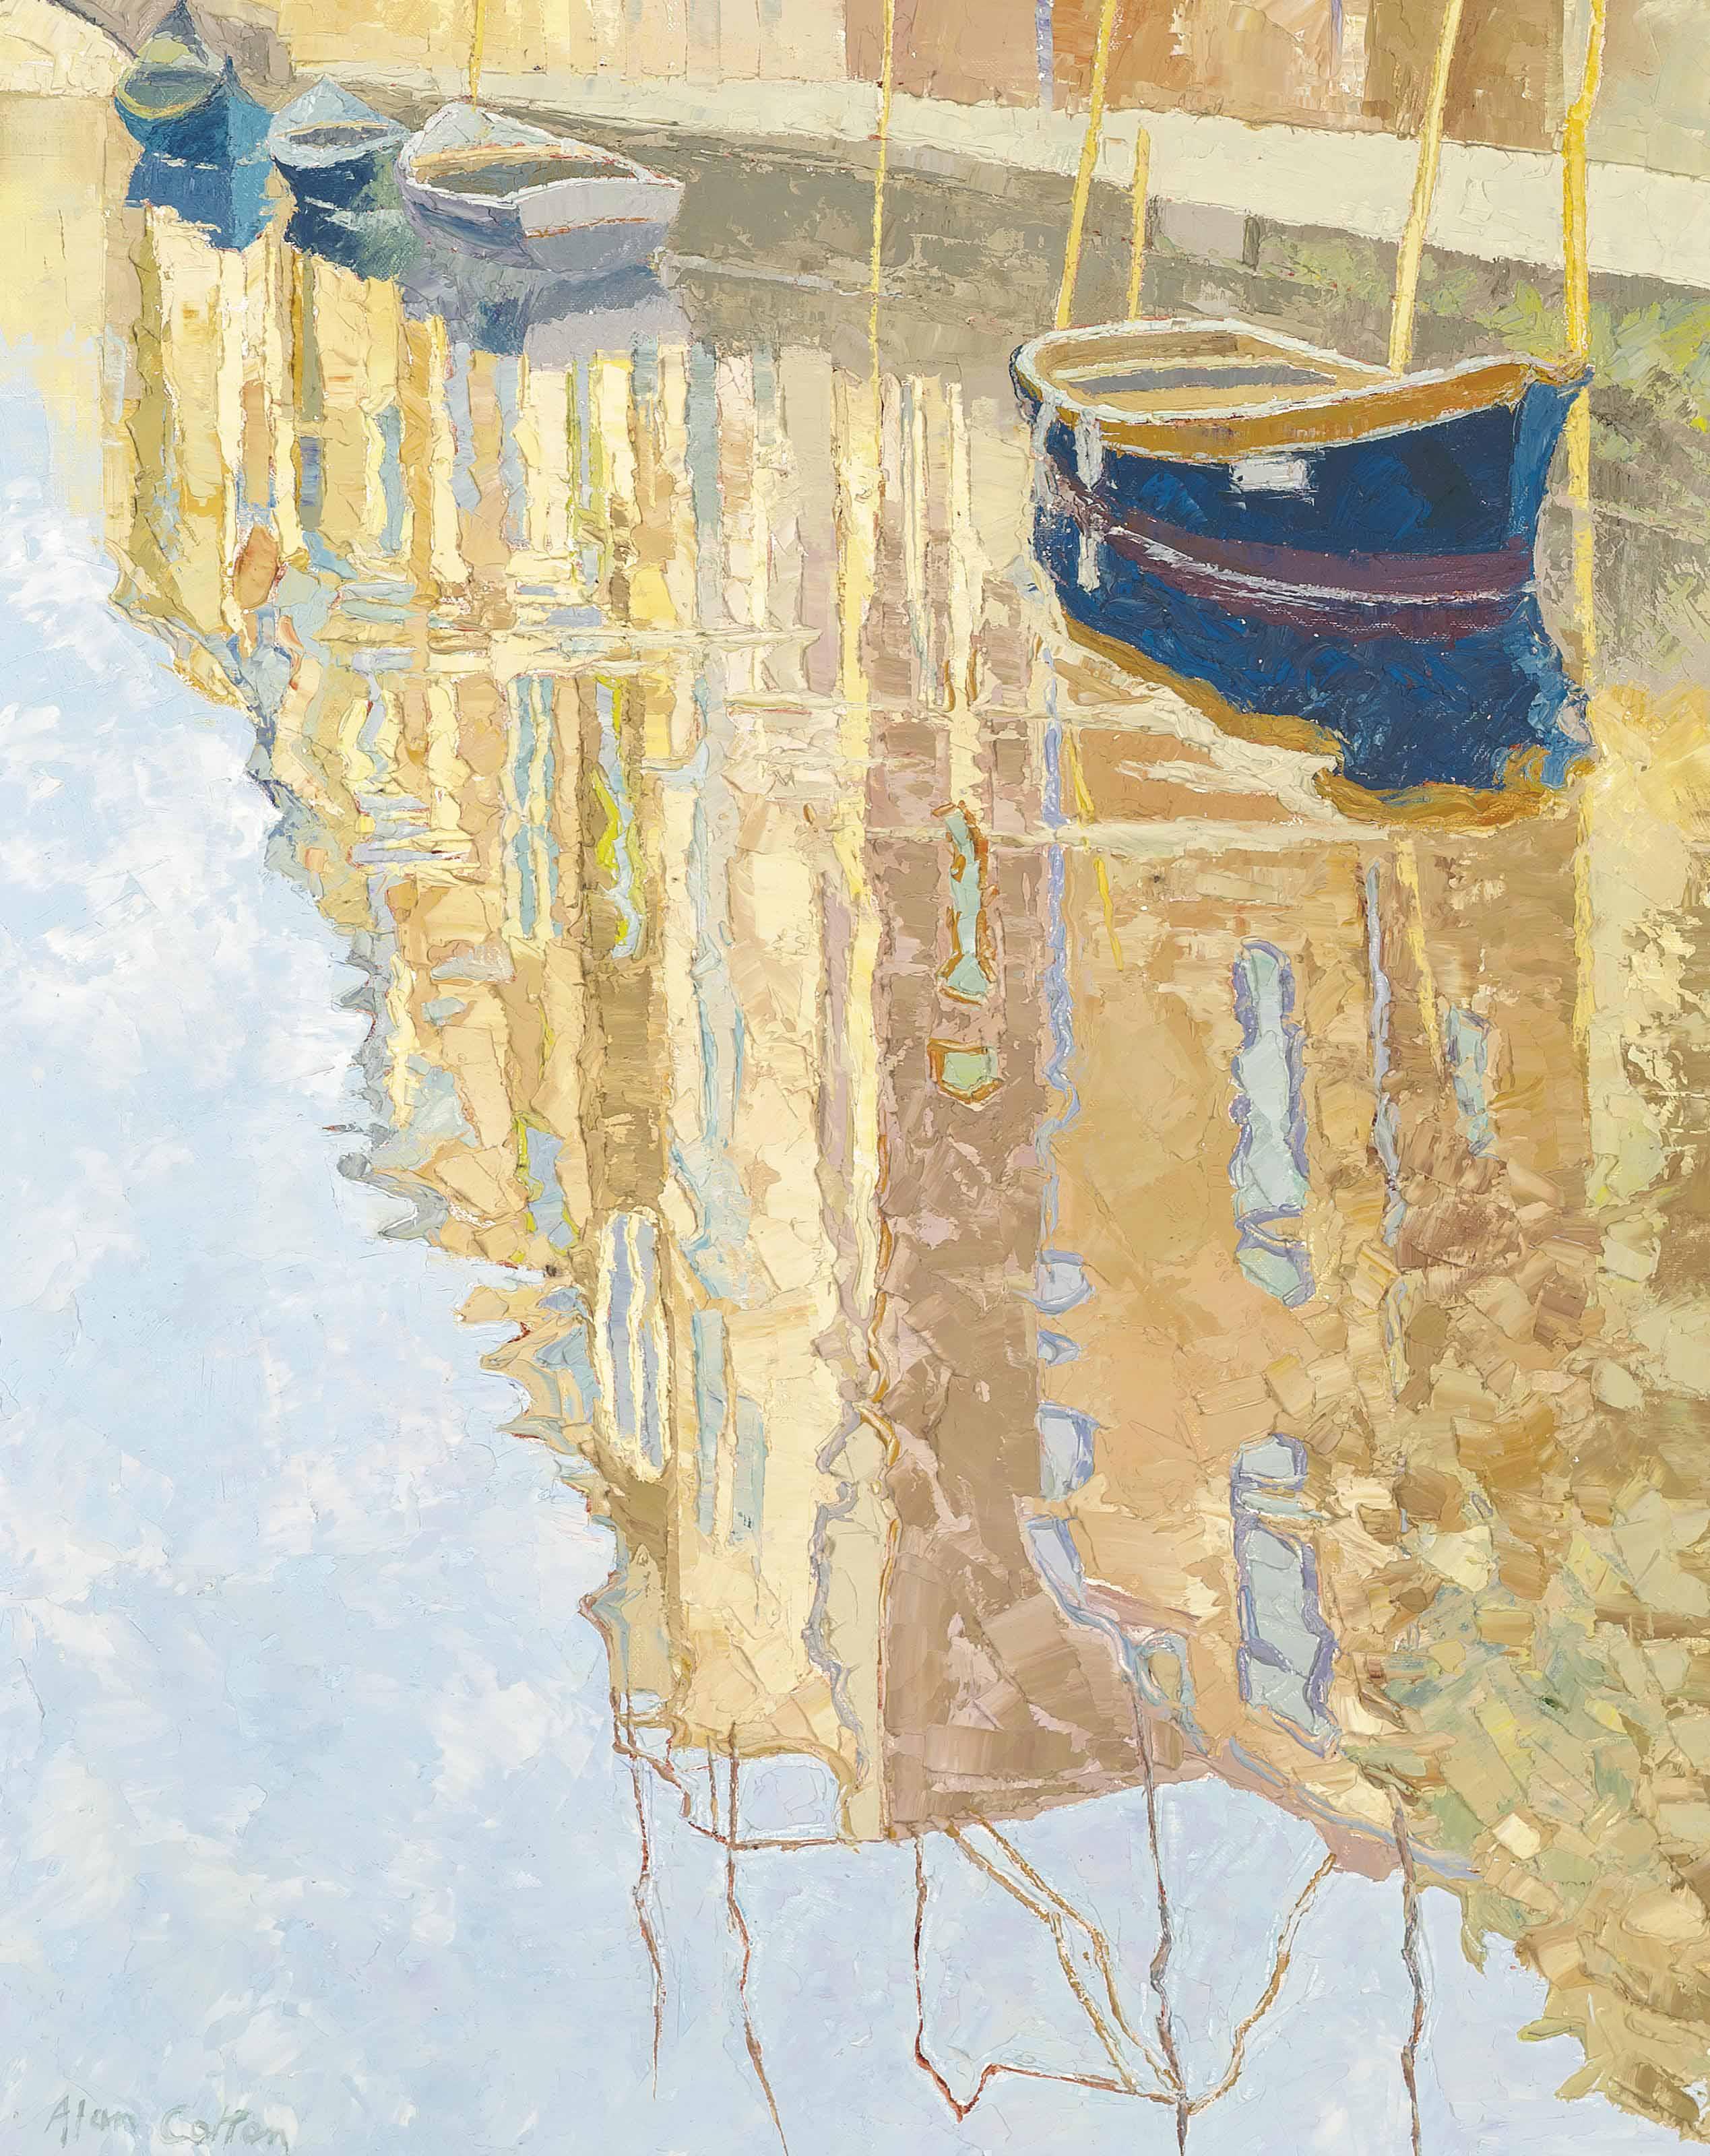 Venice - Reflections of Sunlight Walls Autumn